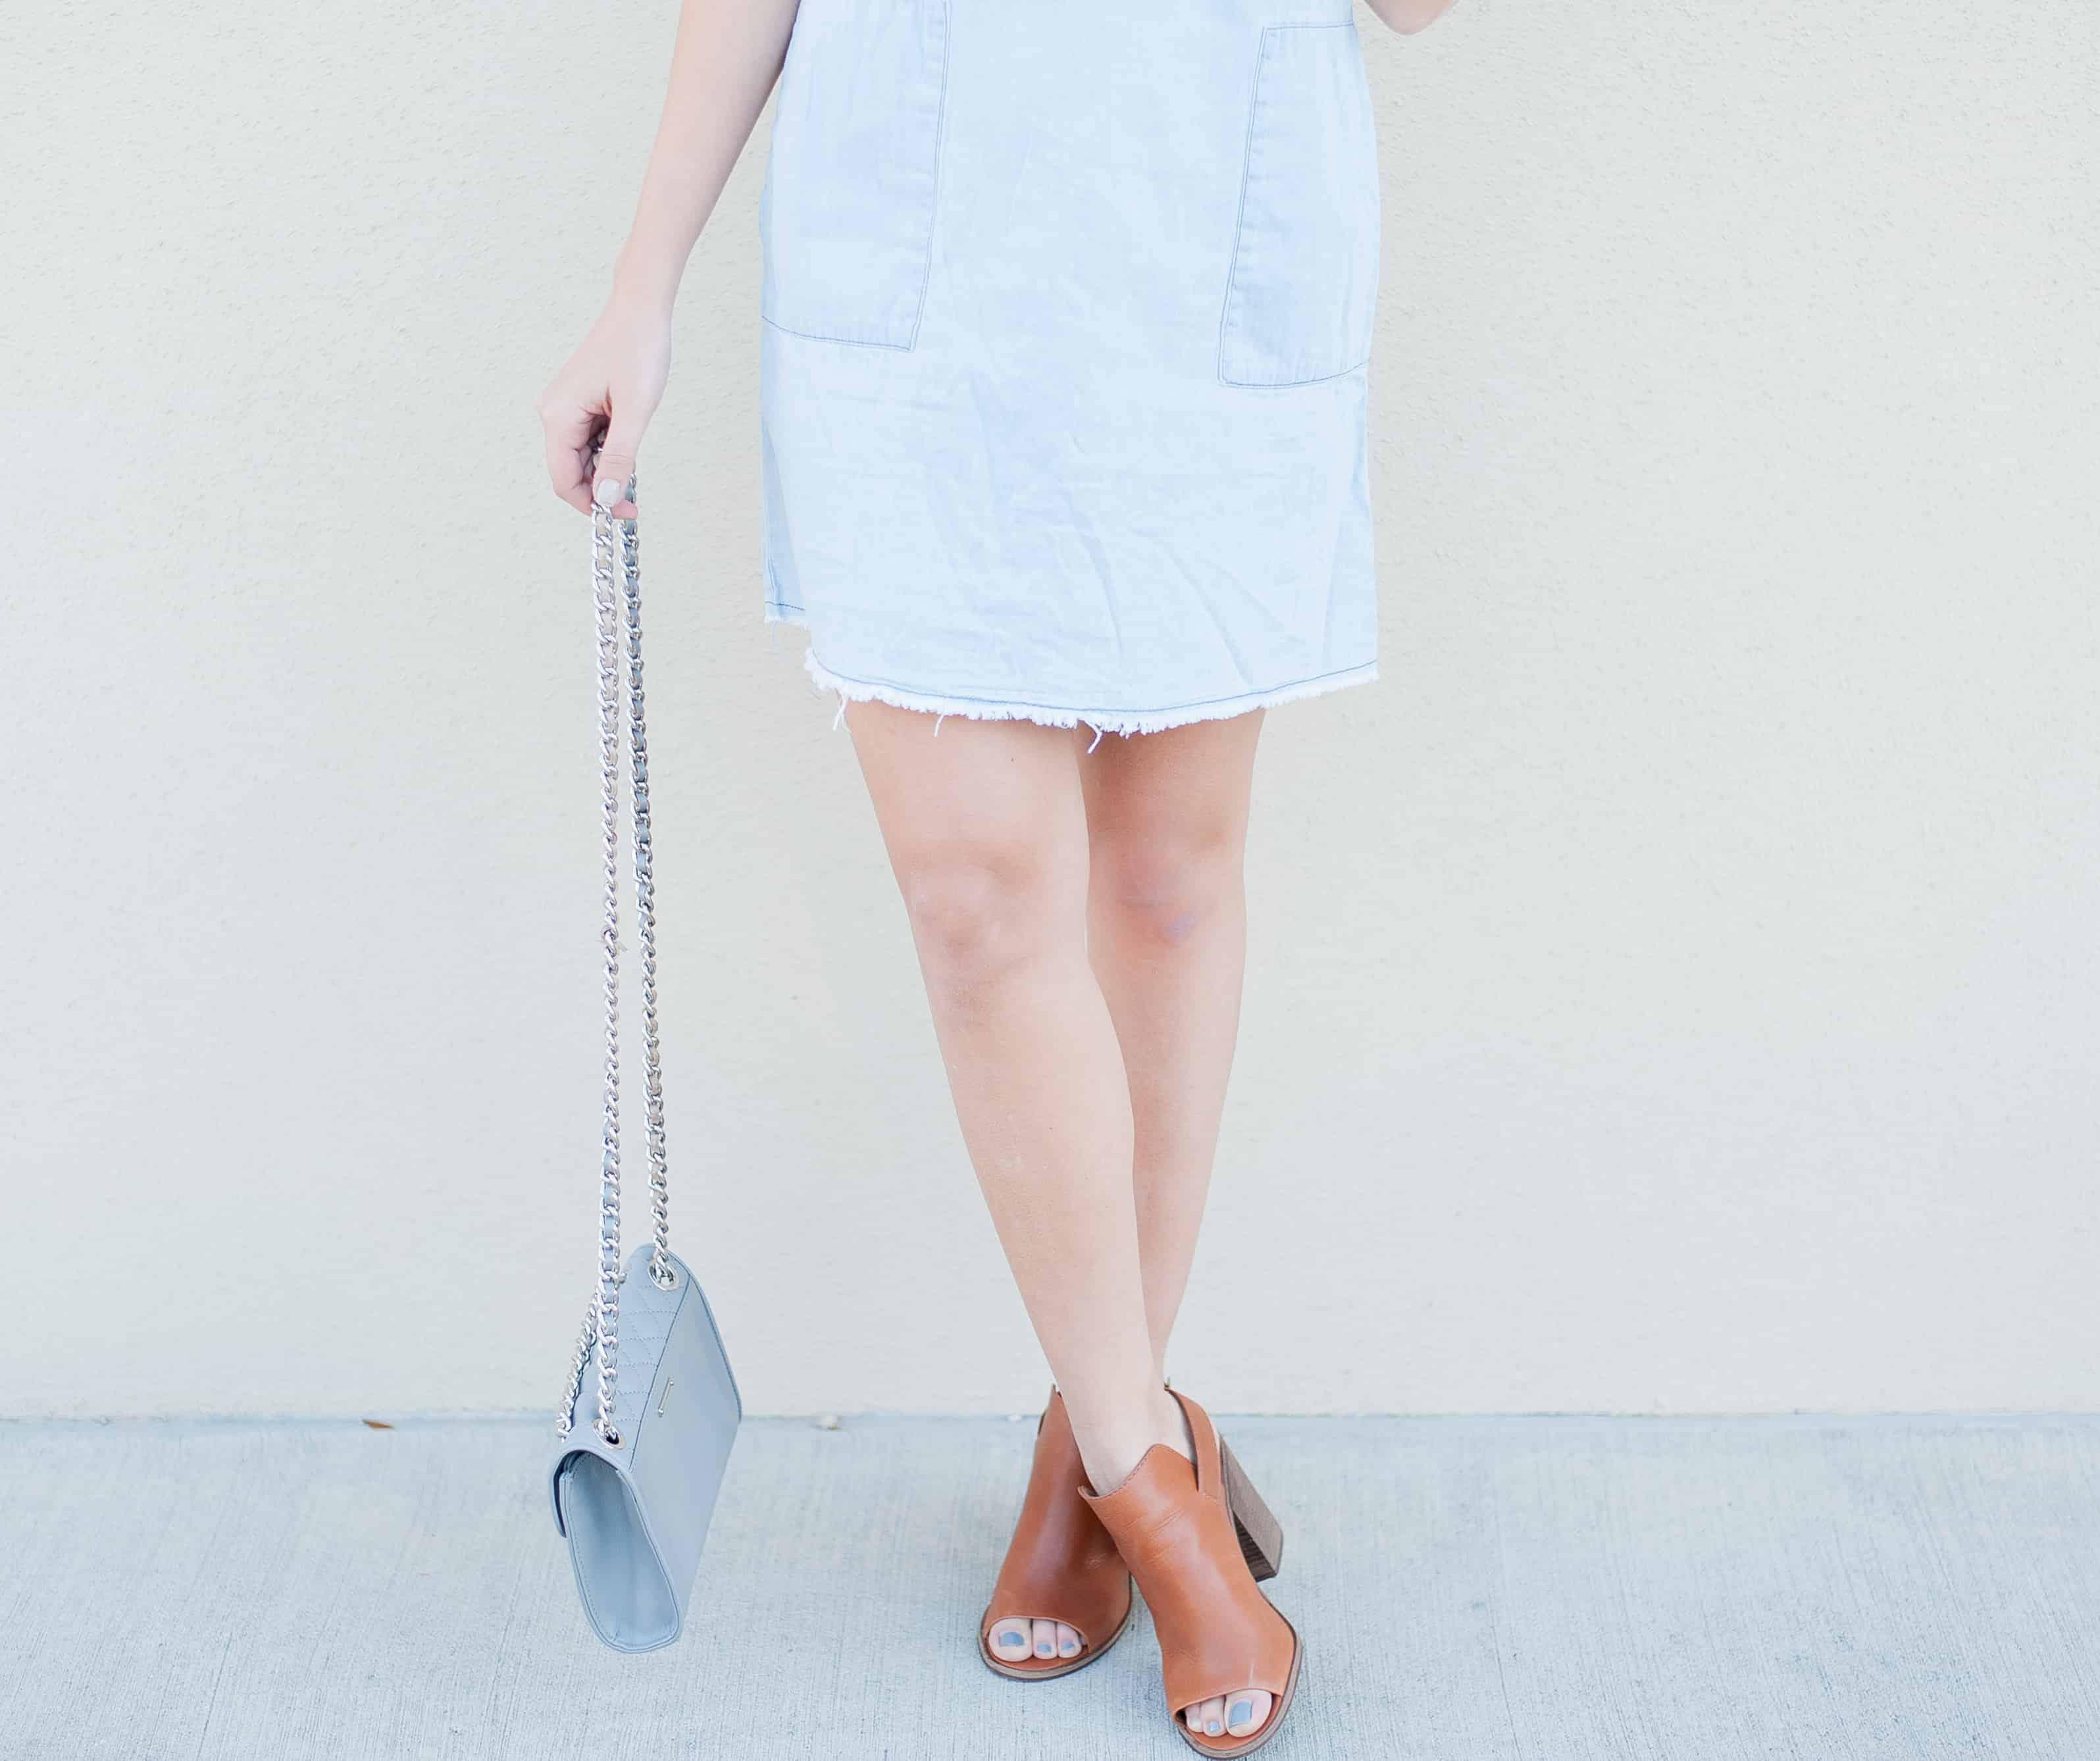 Dress Up Buttercup   Houston Fashion Blog - Dede Raad Chambray Shift Dress